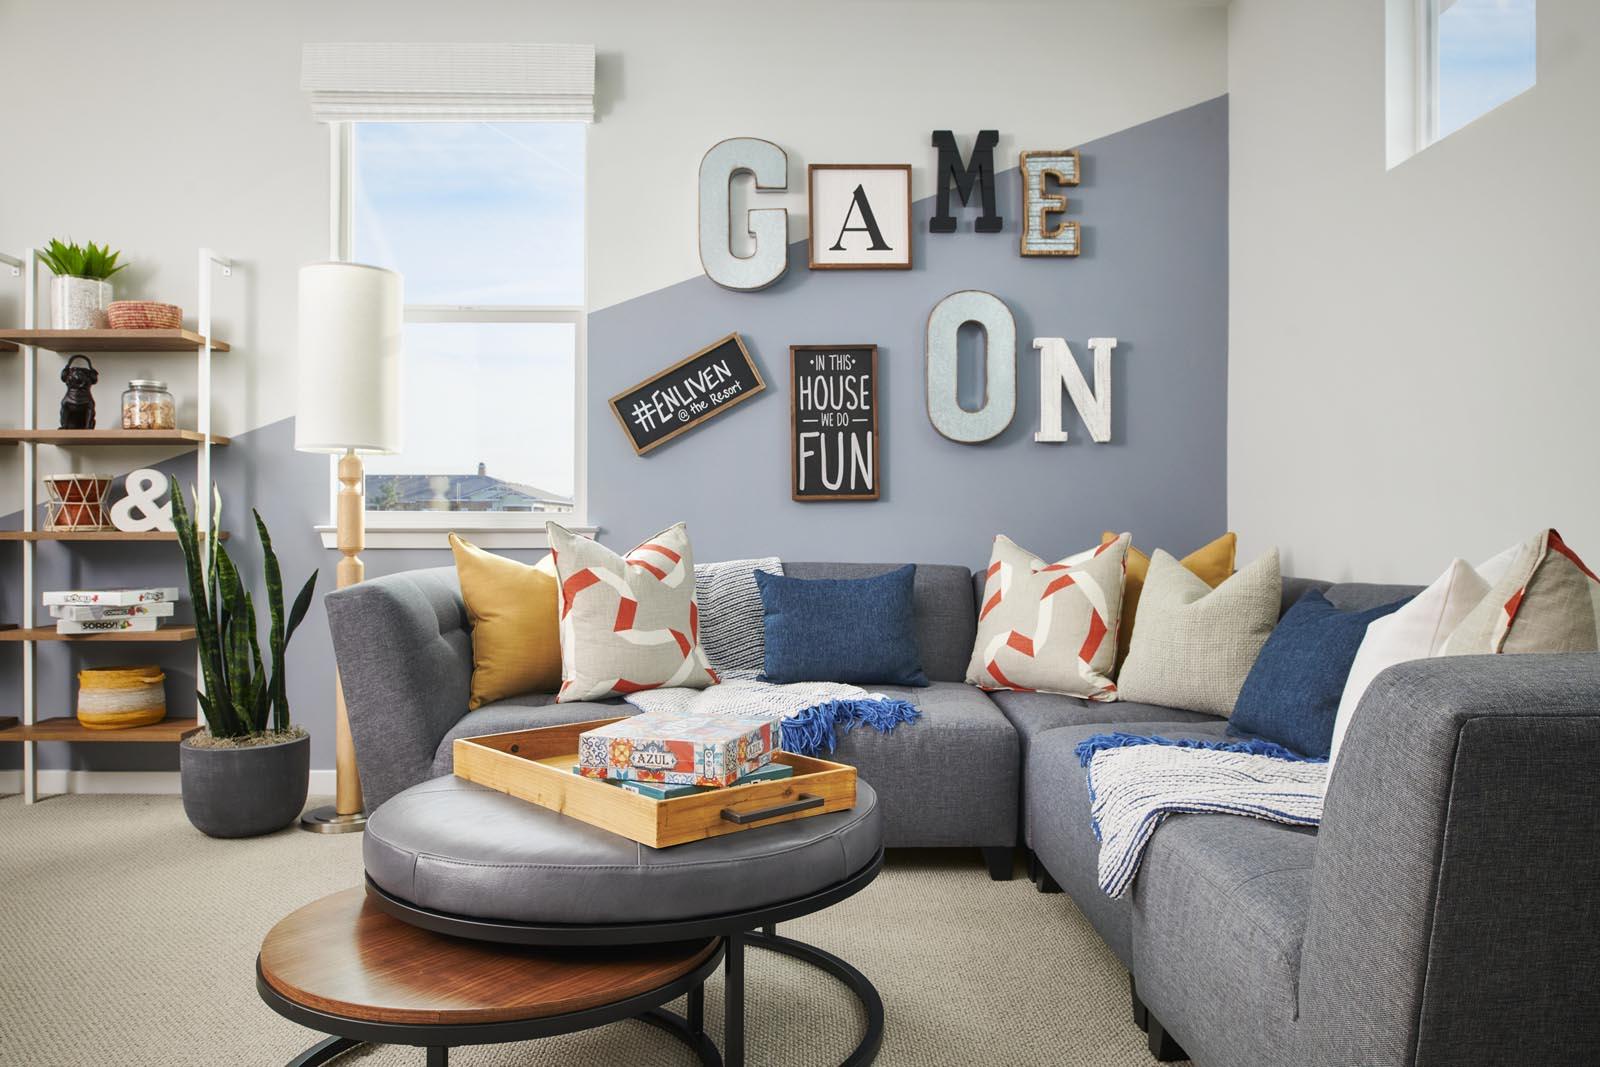 Den | Residence 1 | Enliven | New Homes in Rancho Cucamonga, CA | Van Daele Homes